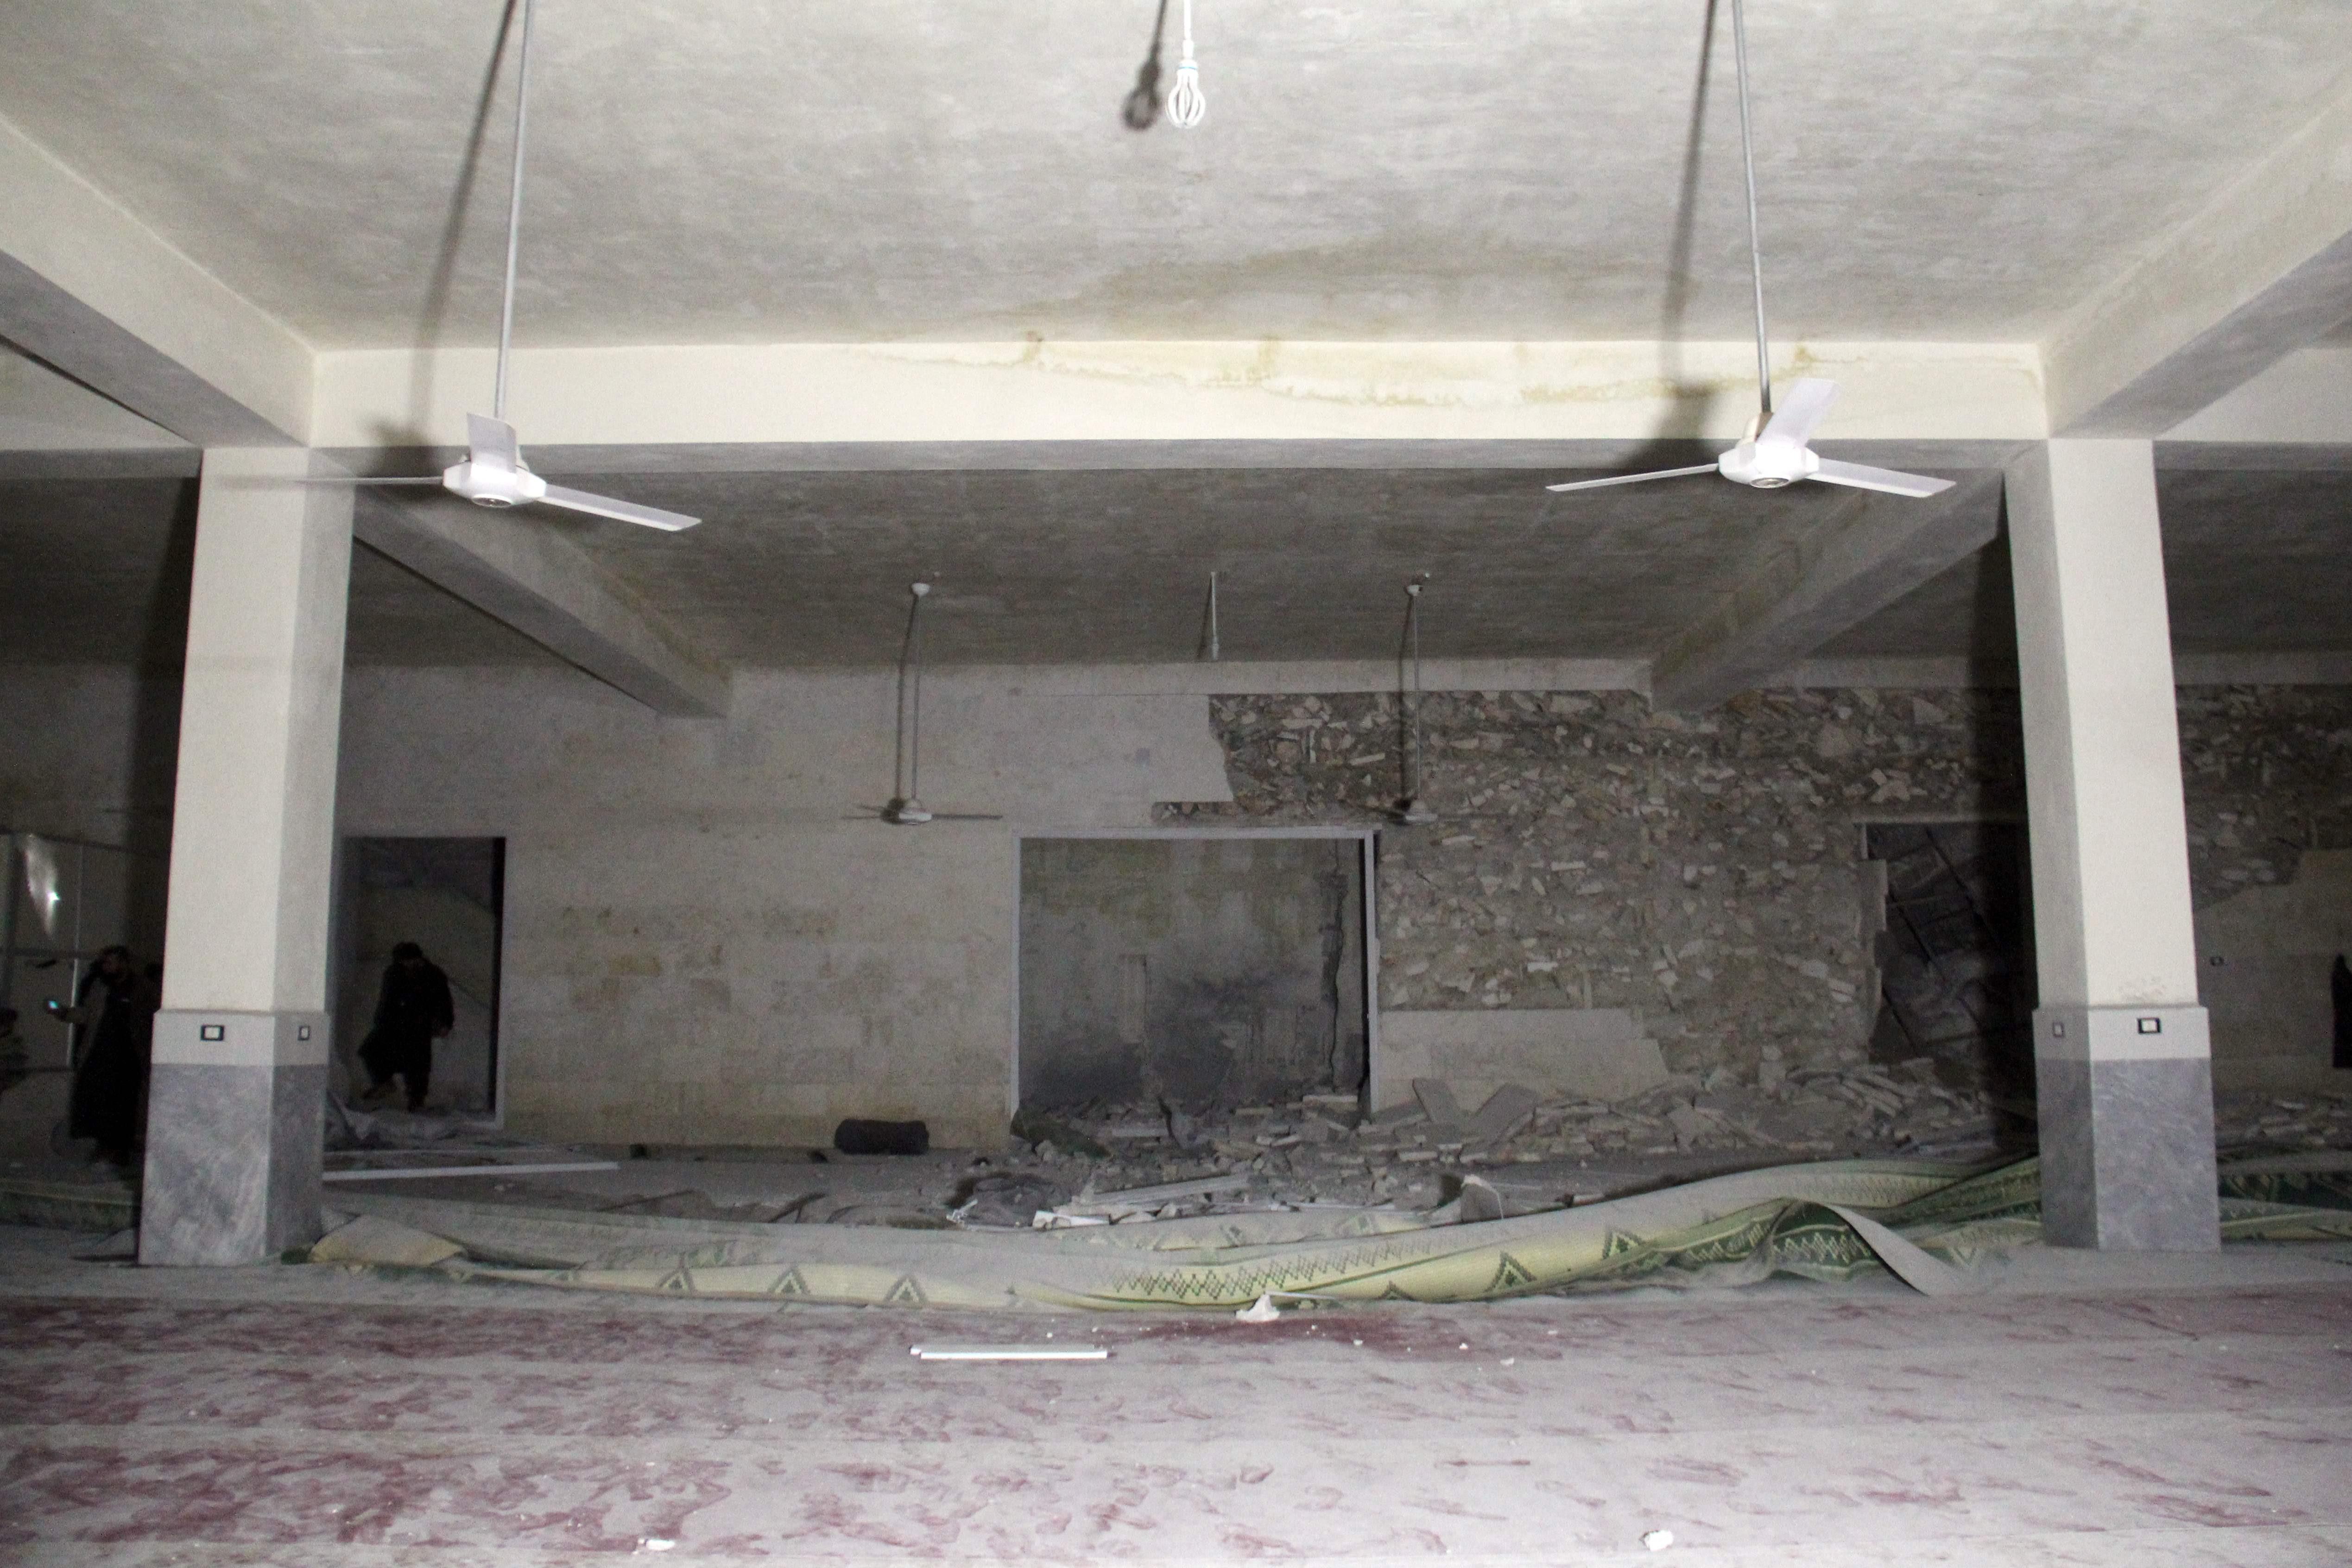 Damaged building, apparently a Muslim prayer hall, at site of al-Jineh air strike